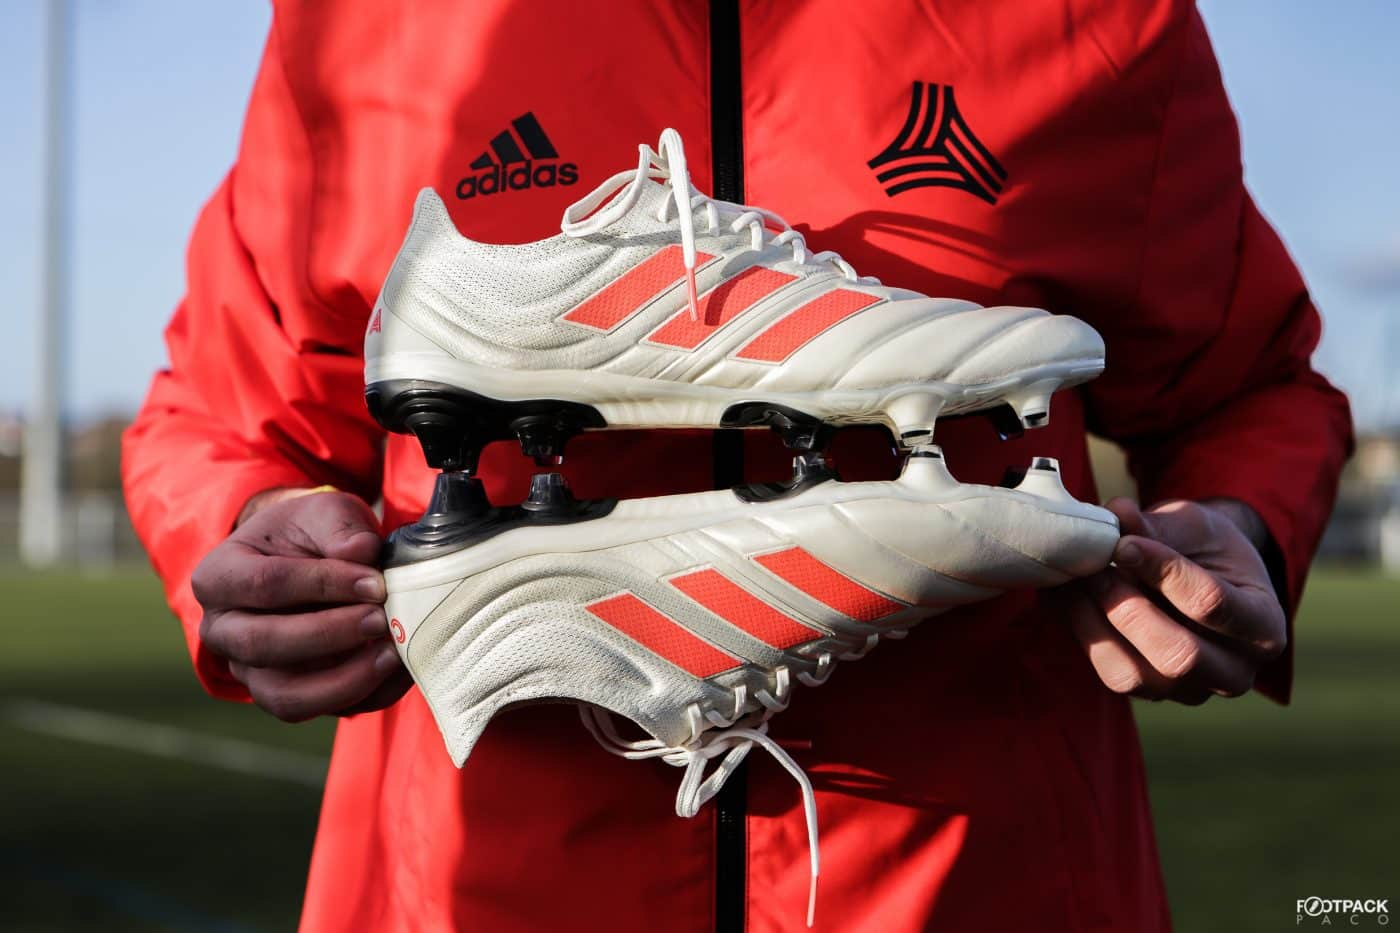 adidas-copa-19.1-footpack-a